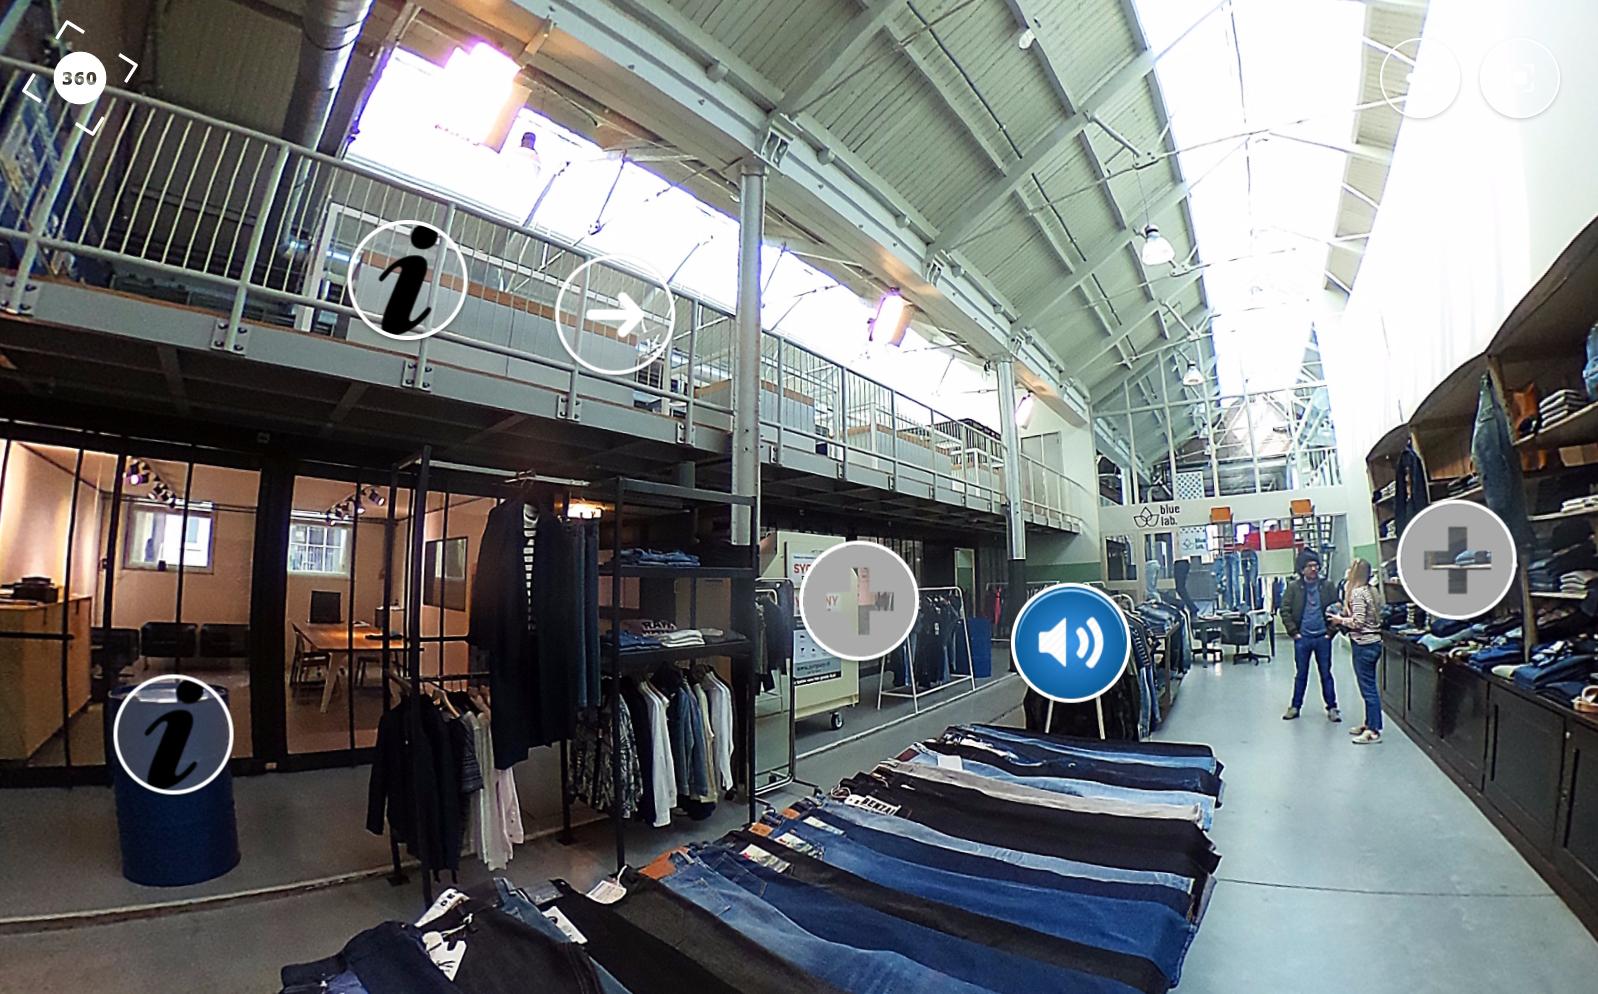 360 graden productie voor Fashion United over The House of Denim | Denim City